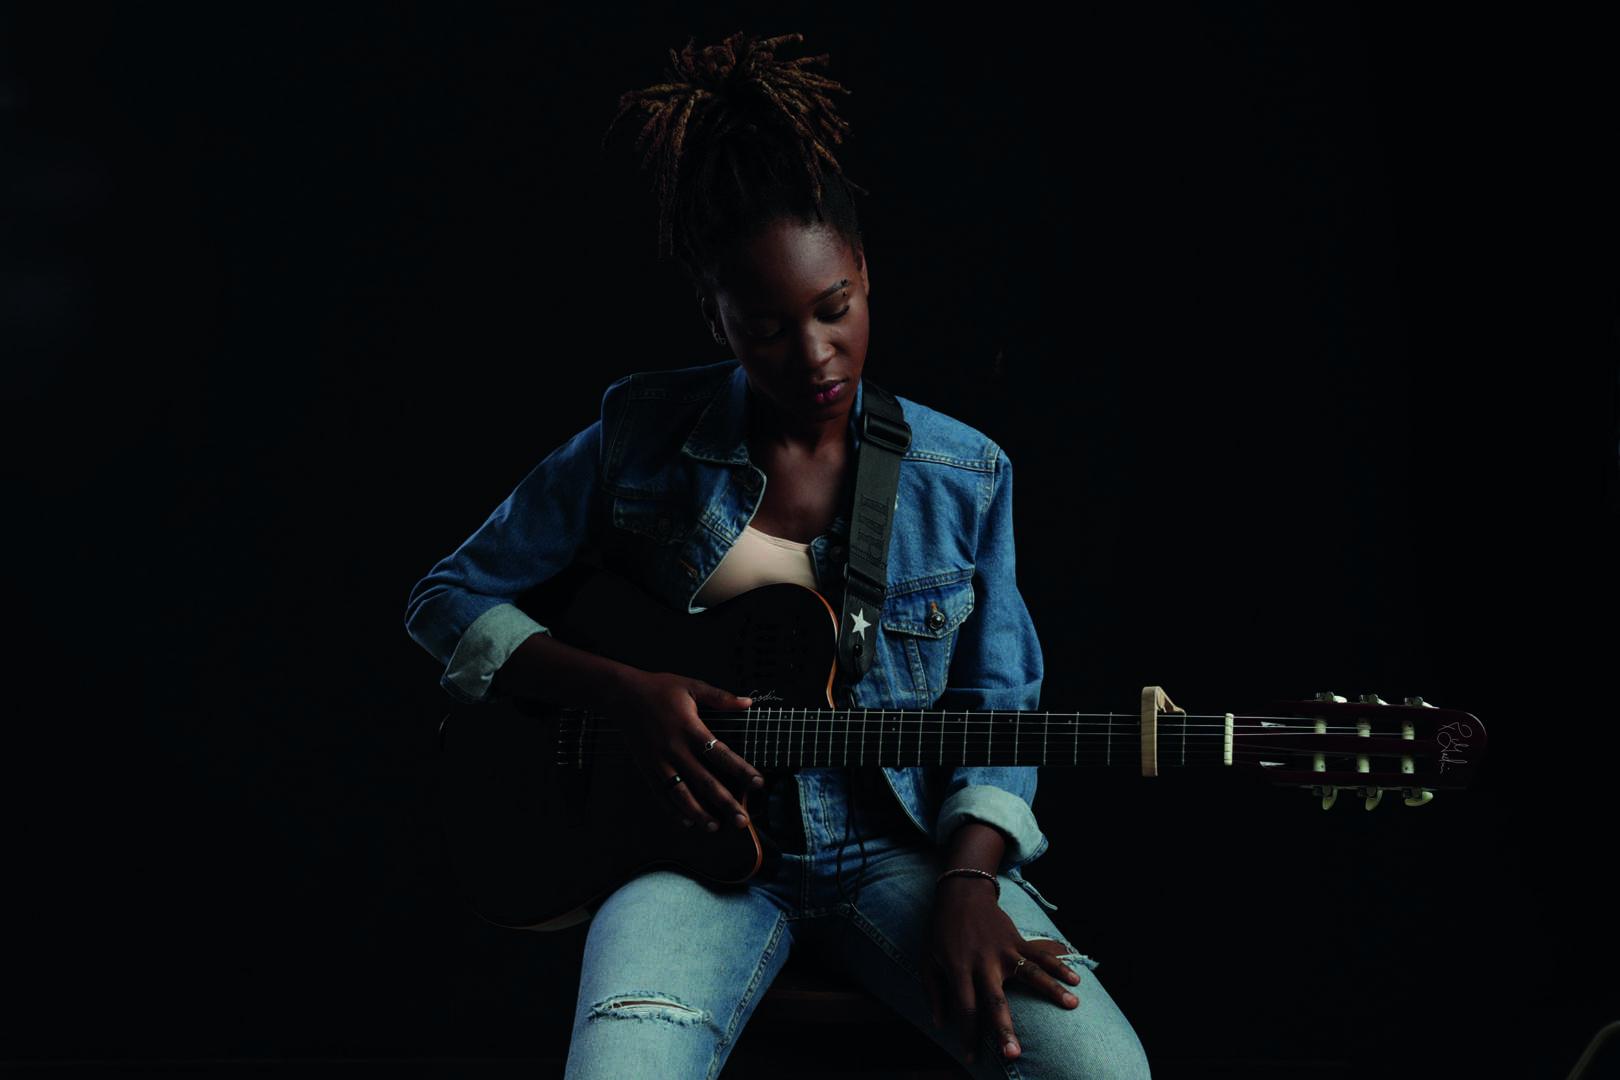 Céline Banza, prix RFI 2019 en concert à l'IFCI